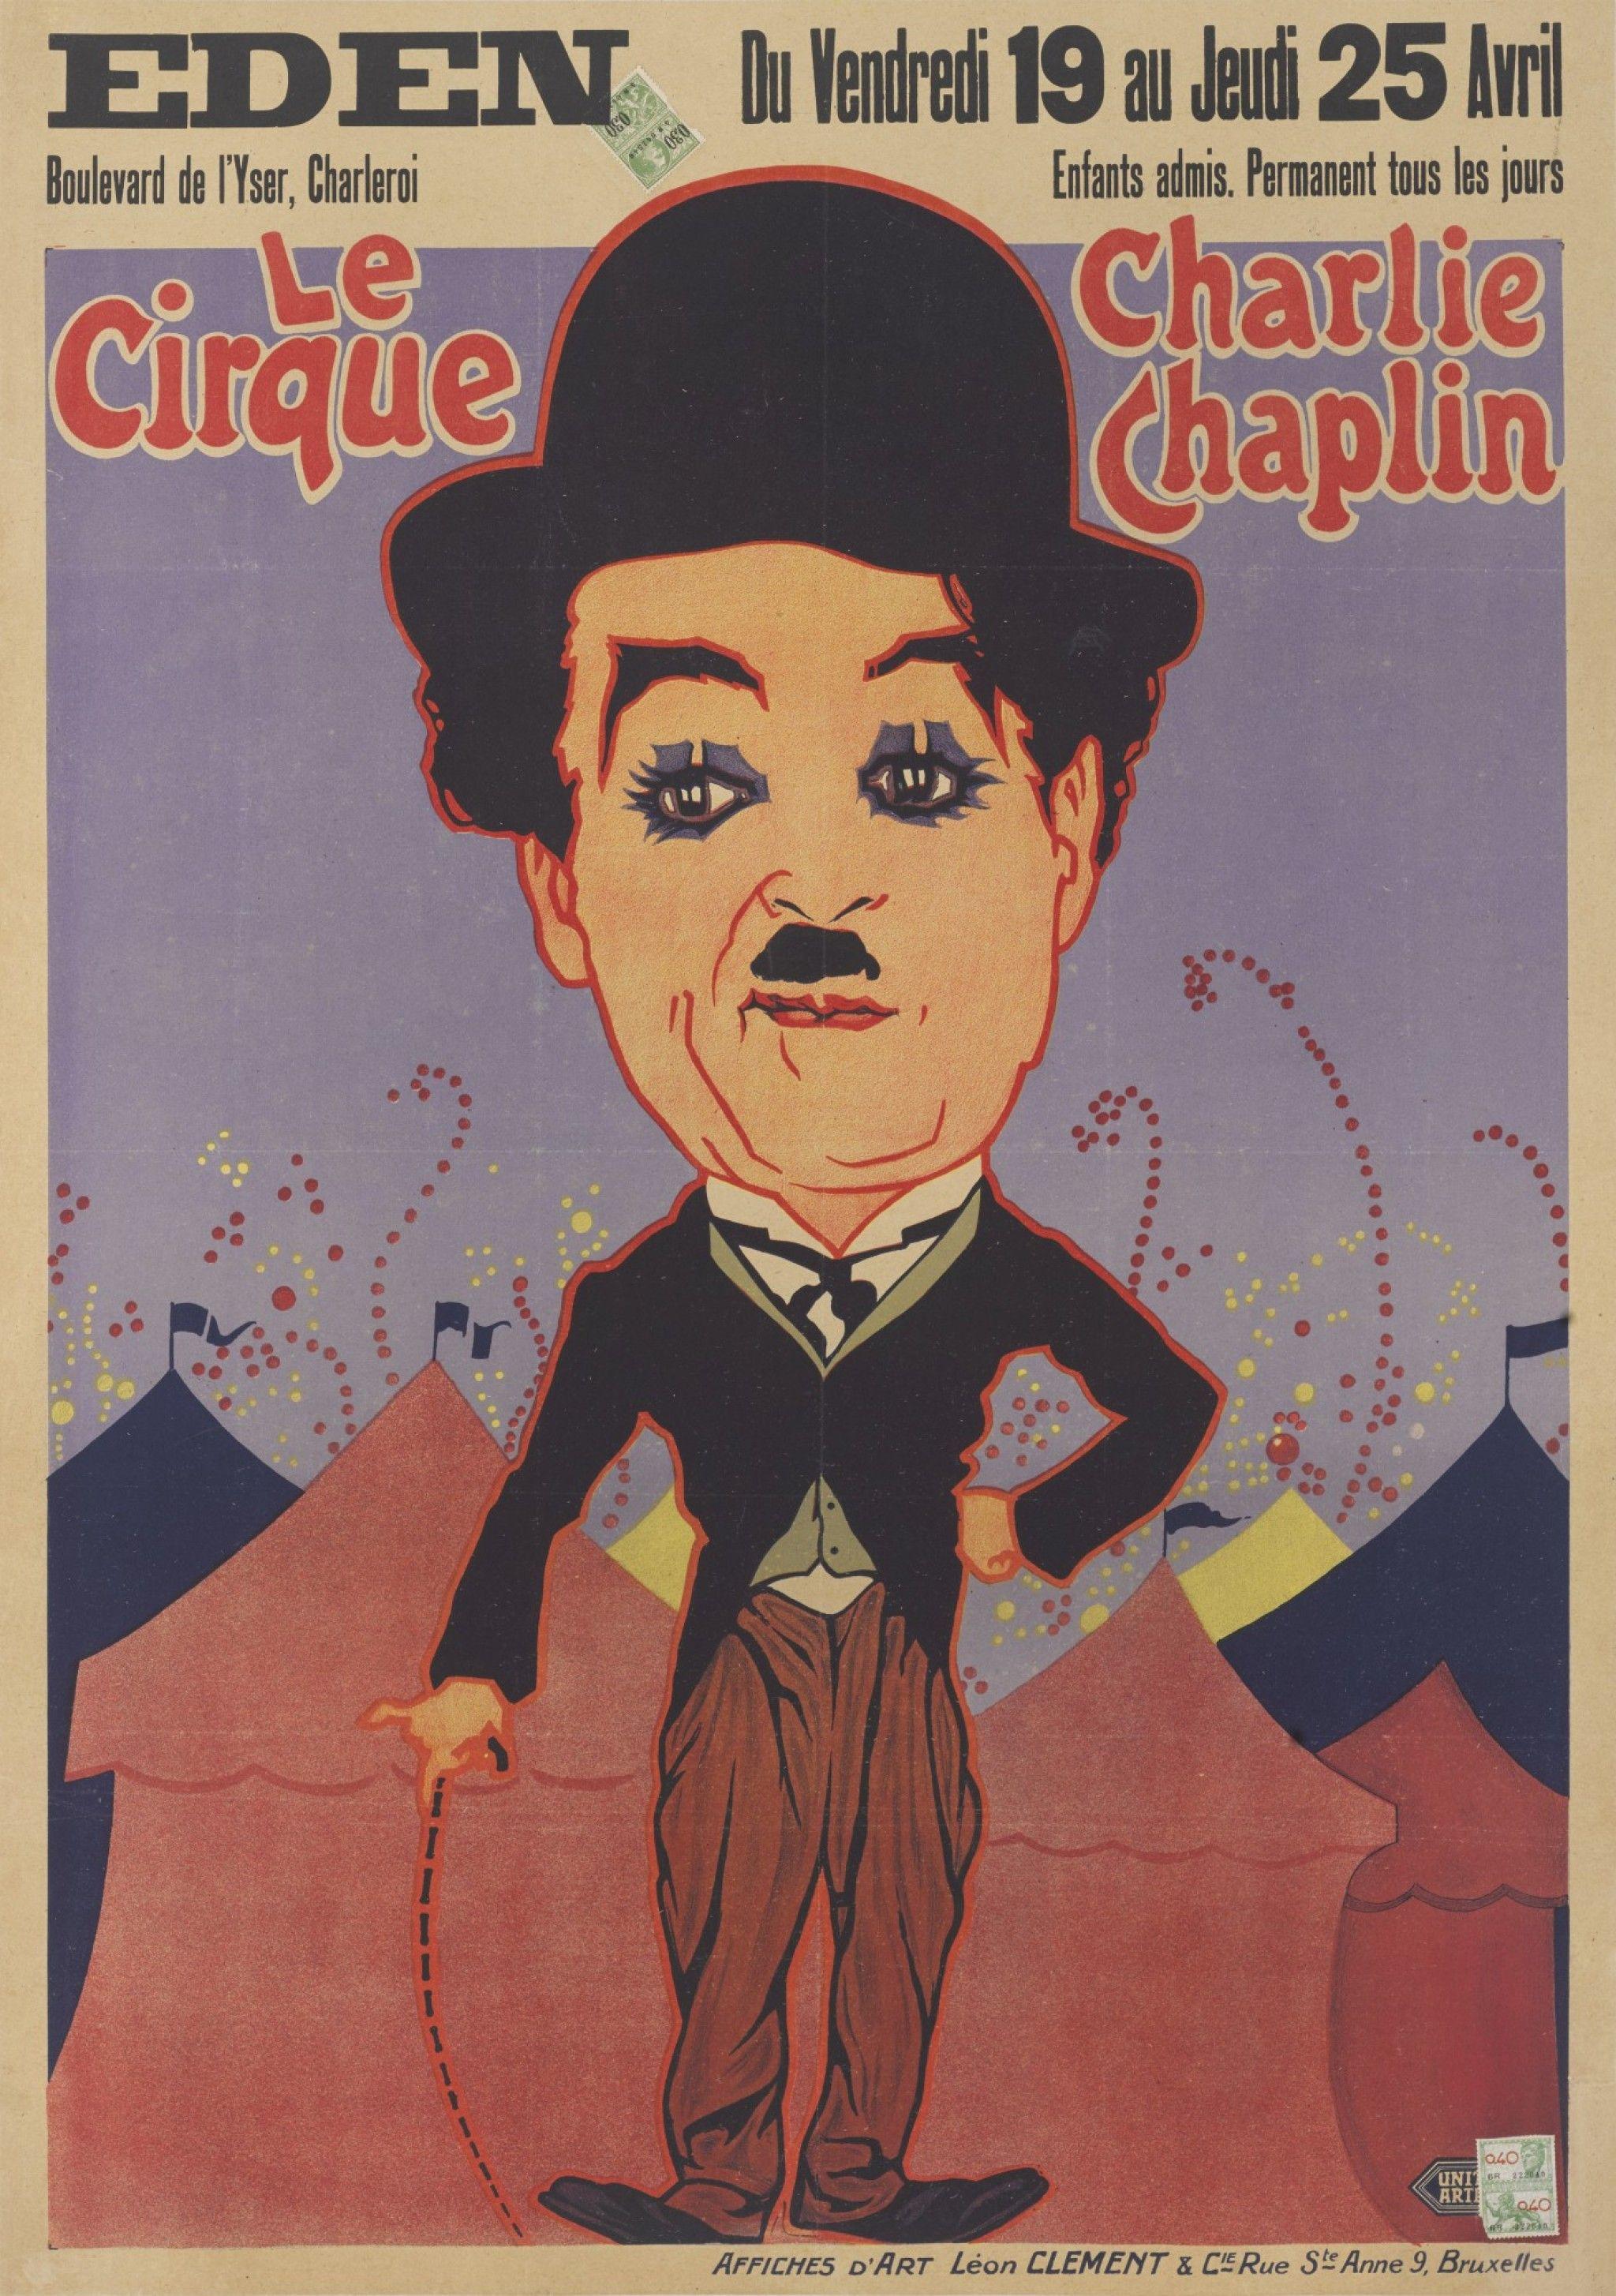 Le Cirque (film) : cirque, (film), CIRCUS, CIRQUE, (1928), POSTER,, BELGIAN, Original, Posters, Online2020, Sotheby's, Circus, Poster,, Movie, Vintage